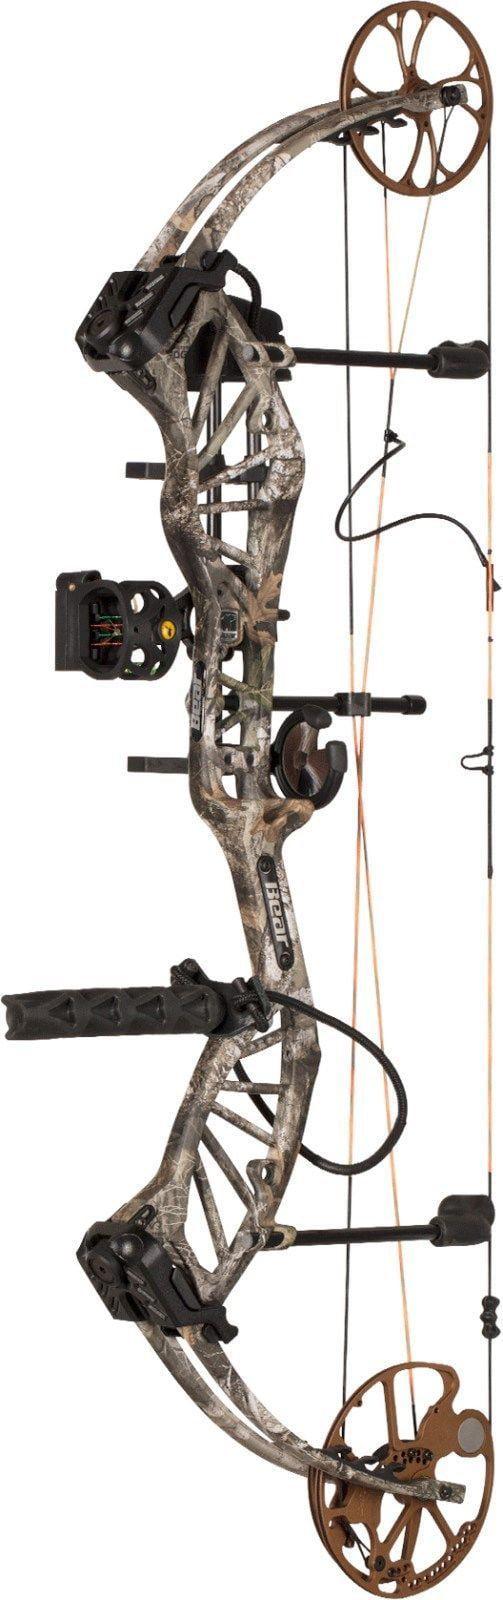 Bear Archery Approach RTH Compound Bow 70# RH Realtree Edge by Bear Archery